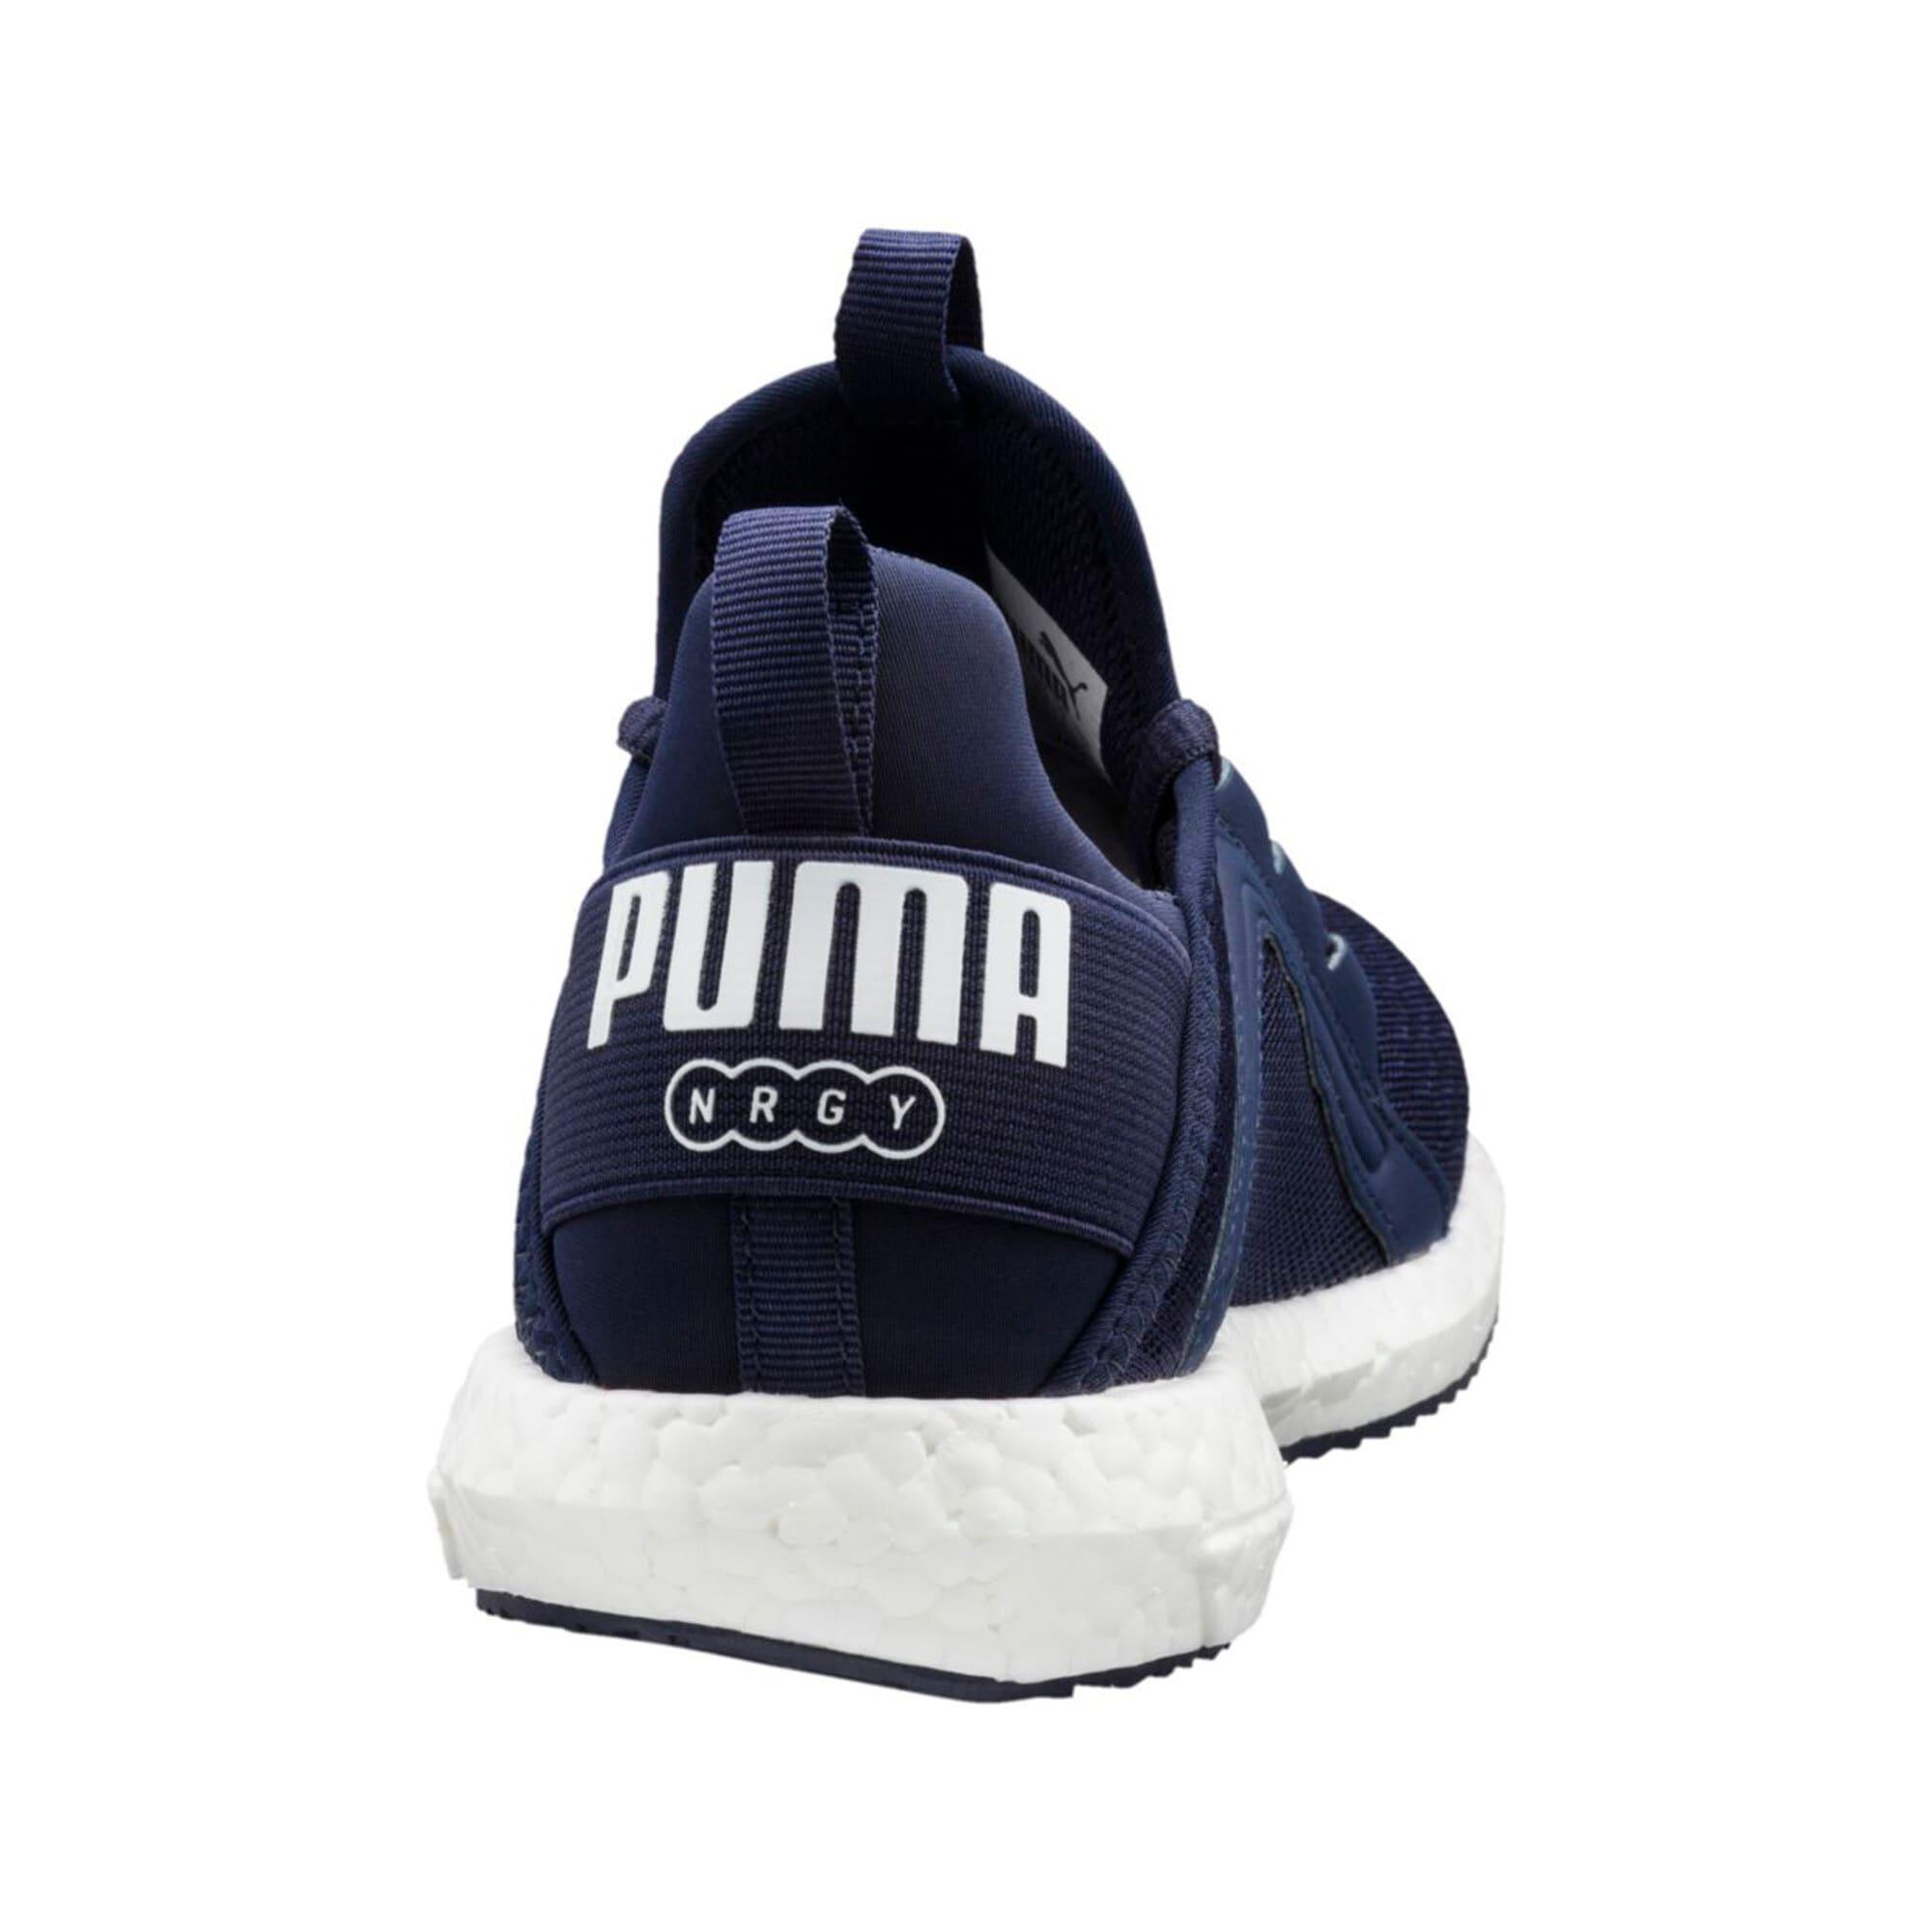 Thumbnail 4 of Mega NRGY Jr Trainers, Peacoat-Puma White, medium-IND